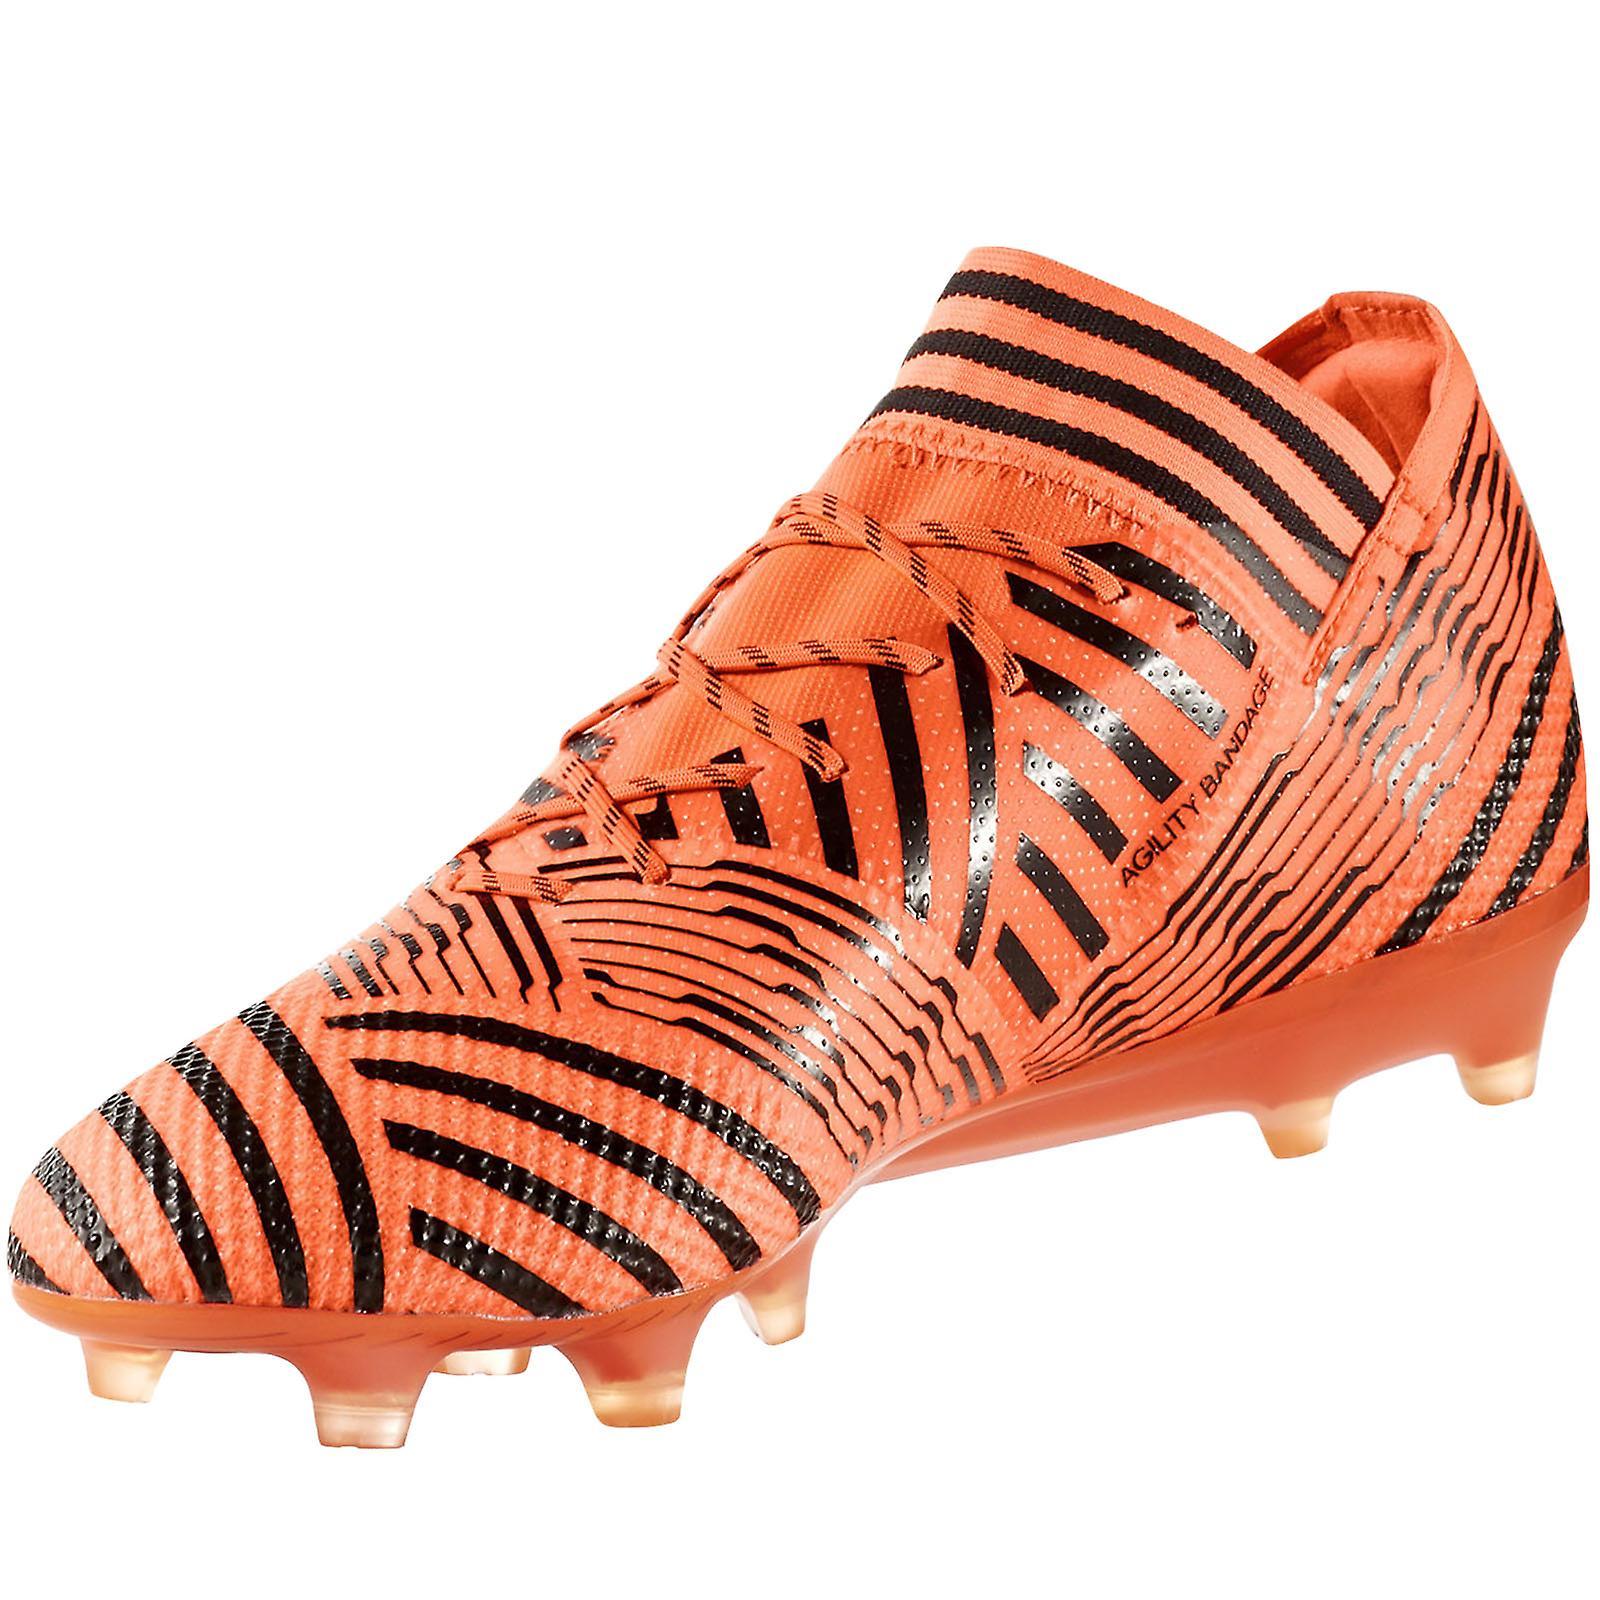 99880c76641a adidas Performance Mens Nemeziz 17.1 FG Football Soccer Training Boots -  Orange